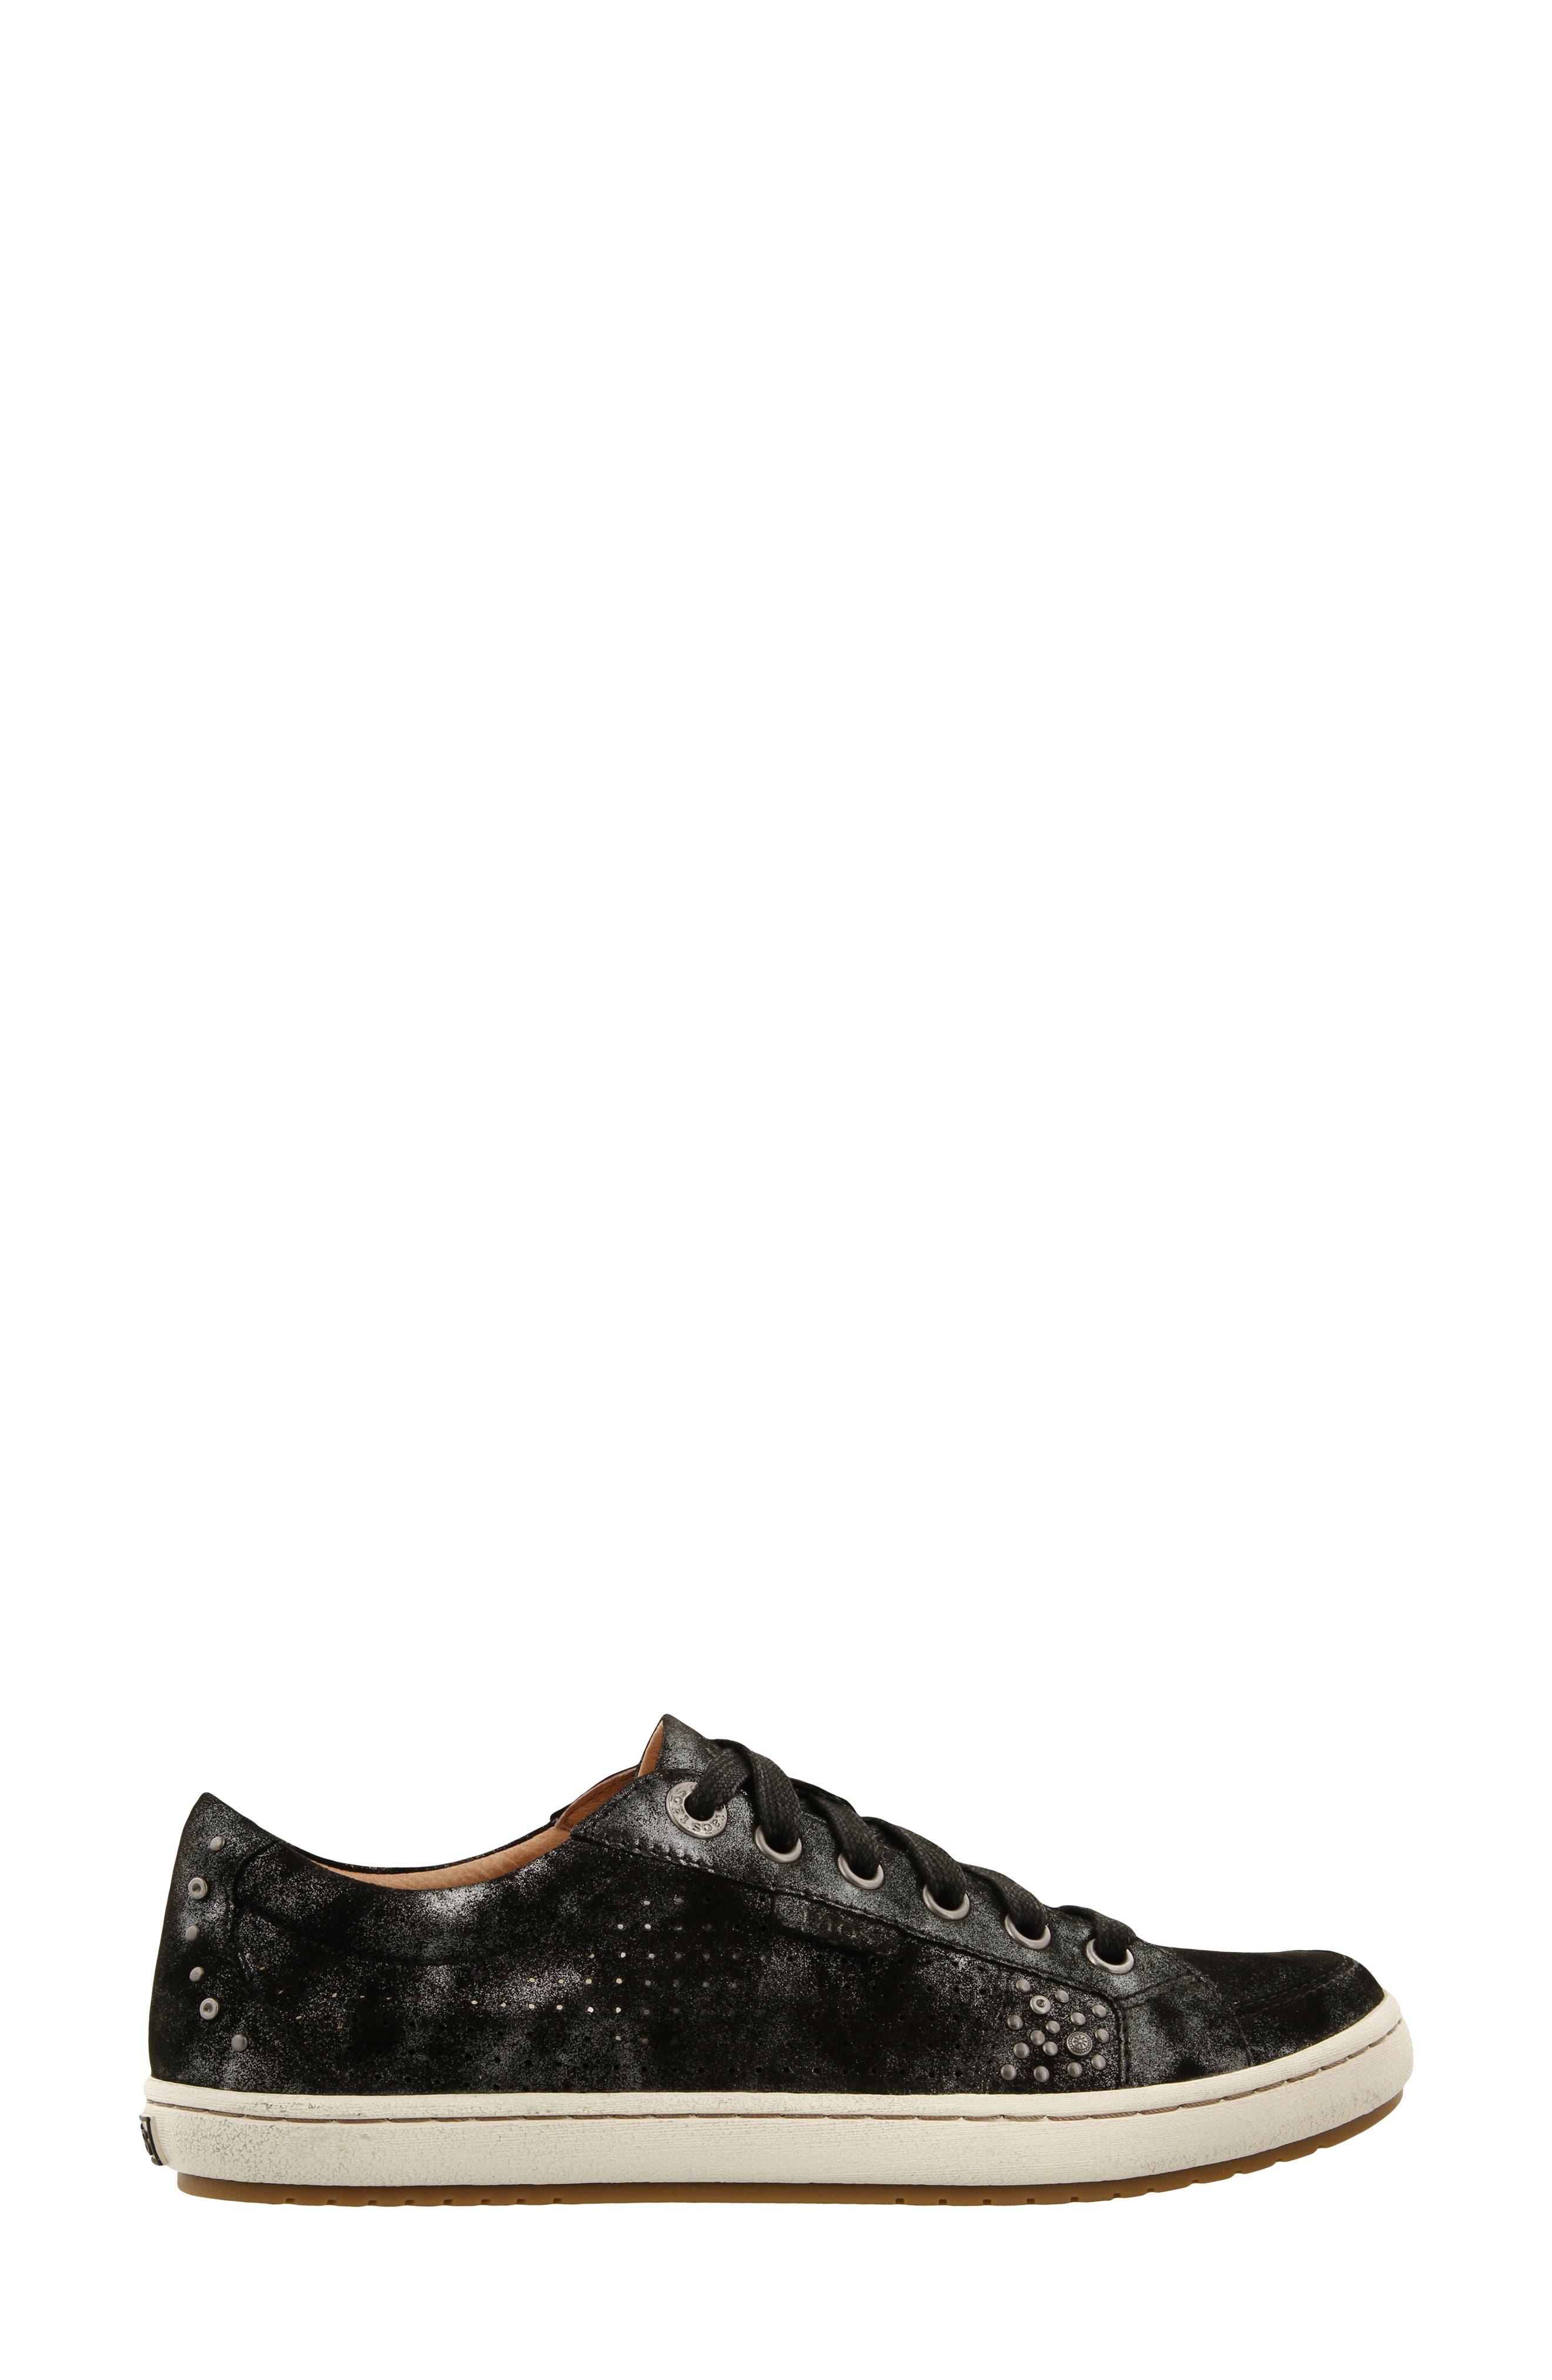 'Freedom' Sneaker,                             Alternate thumbnail 3, color,                             BLACK METALLIC LEATHER